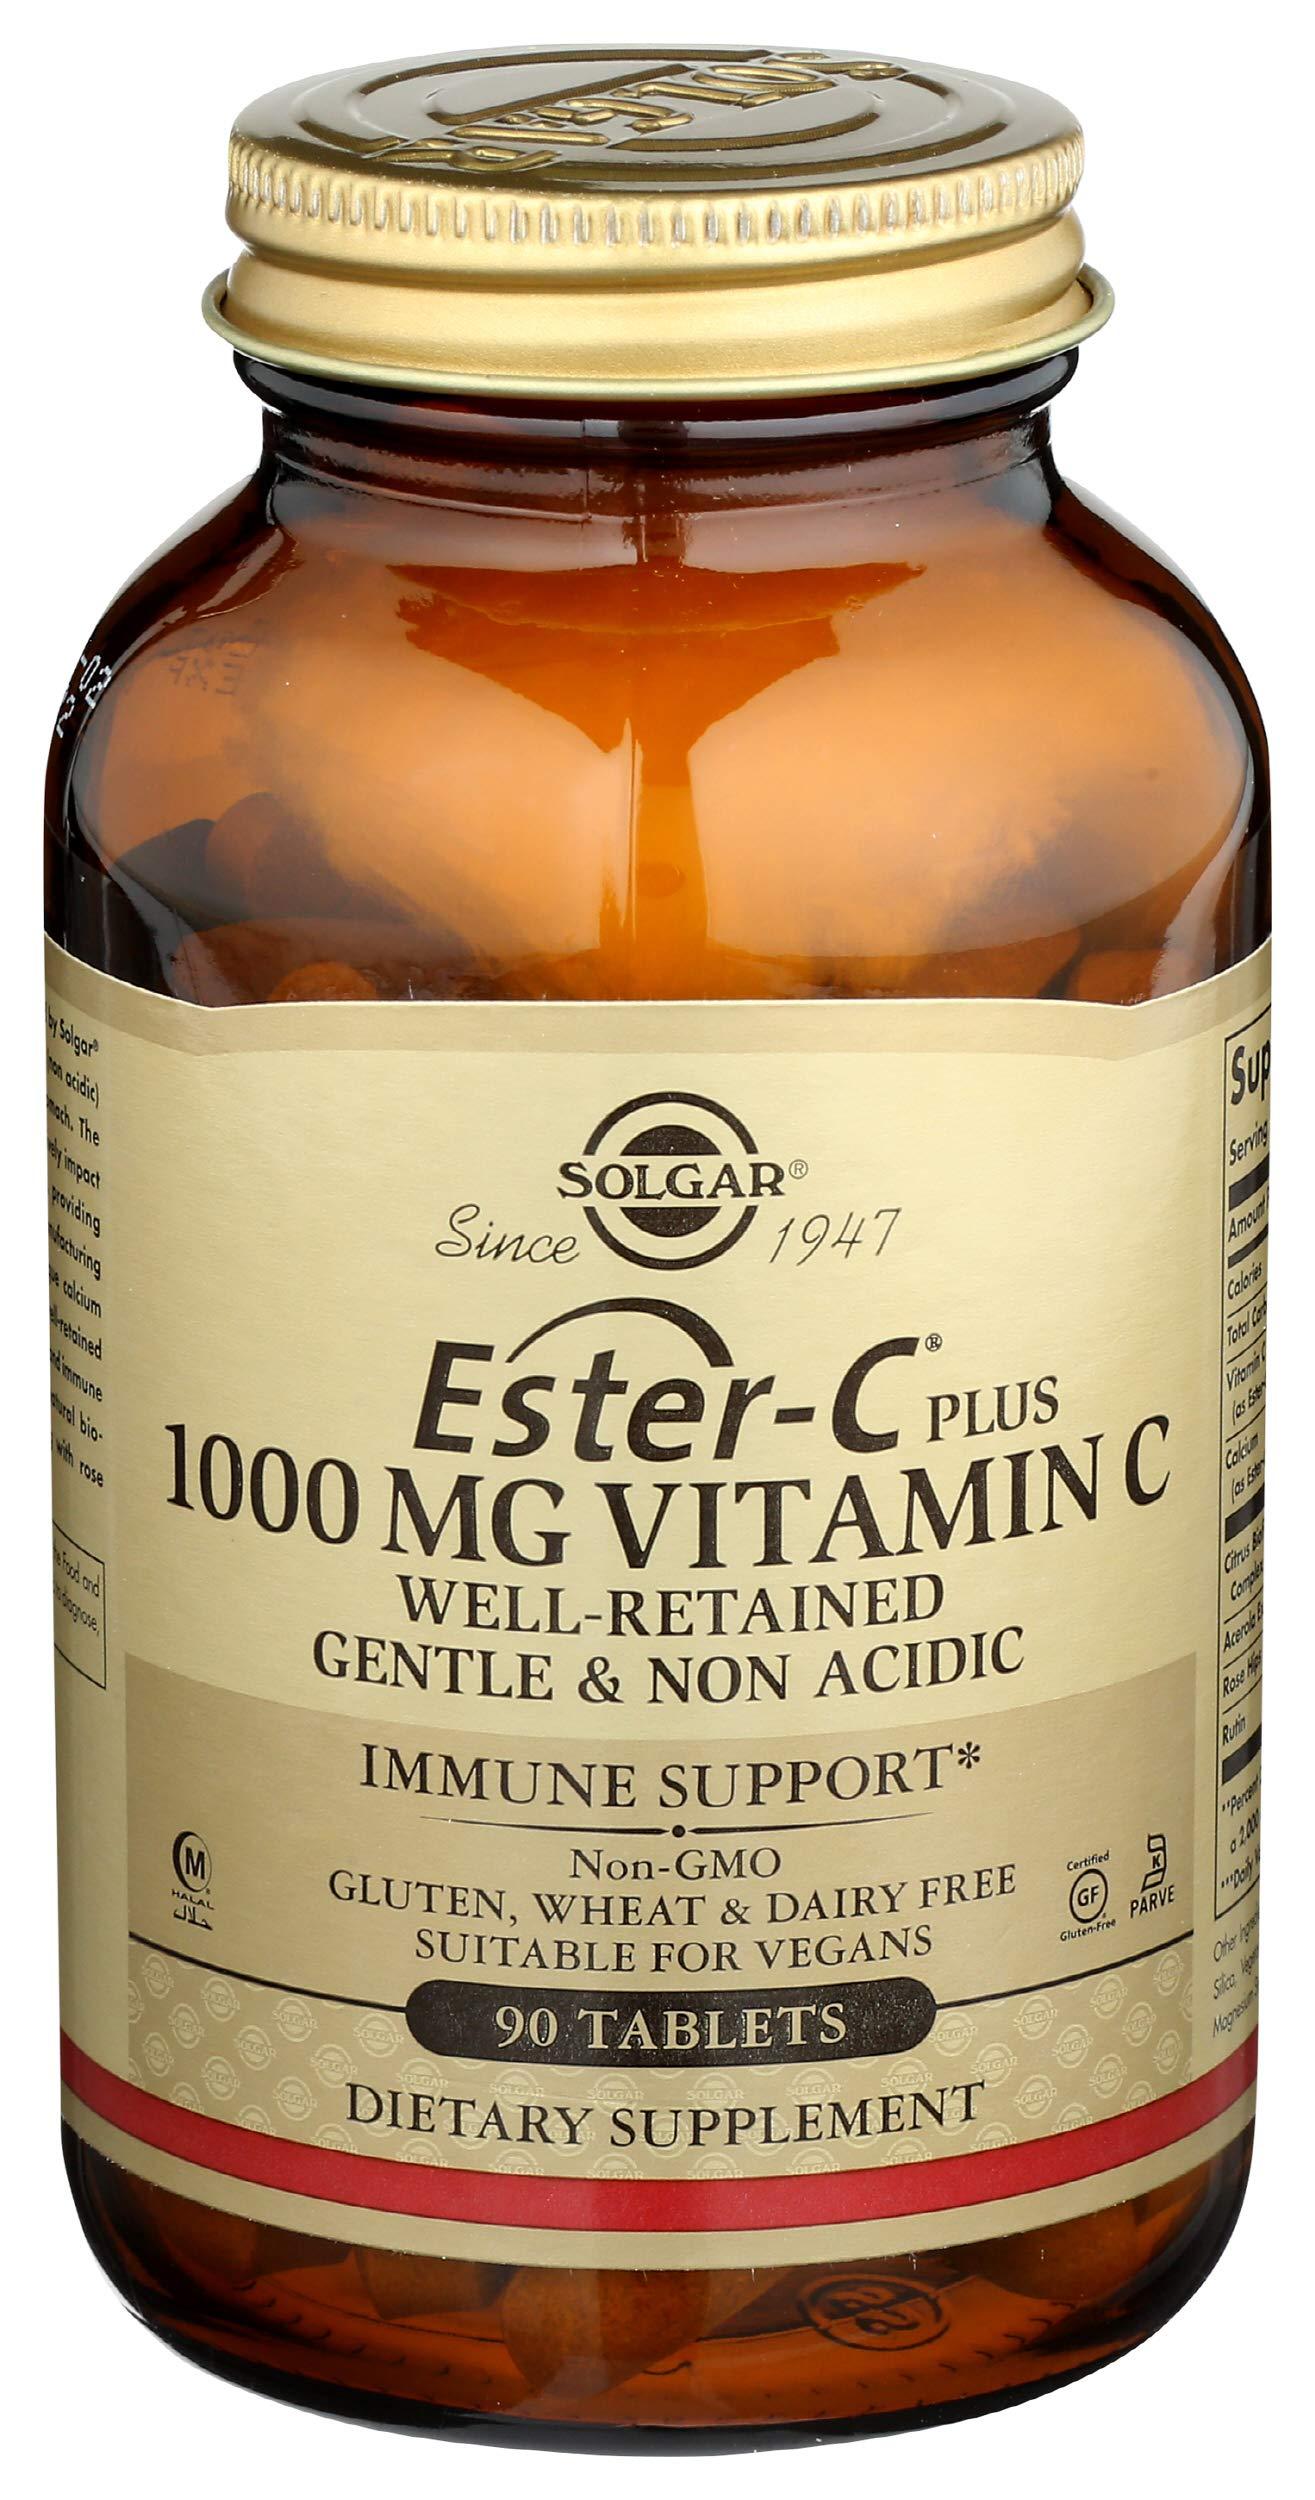 Solgar Ester-C Plus 1000 mg Vitamin C (Ascorbate Complex), 90 Tablets - Gentle On The Stomach & Non Acidic - Antioxidant & Immune System Support - Non GMO, Vegan, Gluten Free, Kosher - 90 Servings